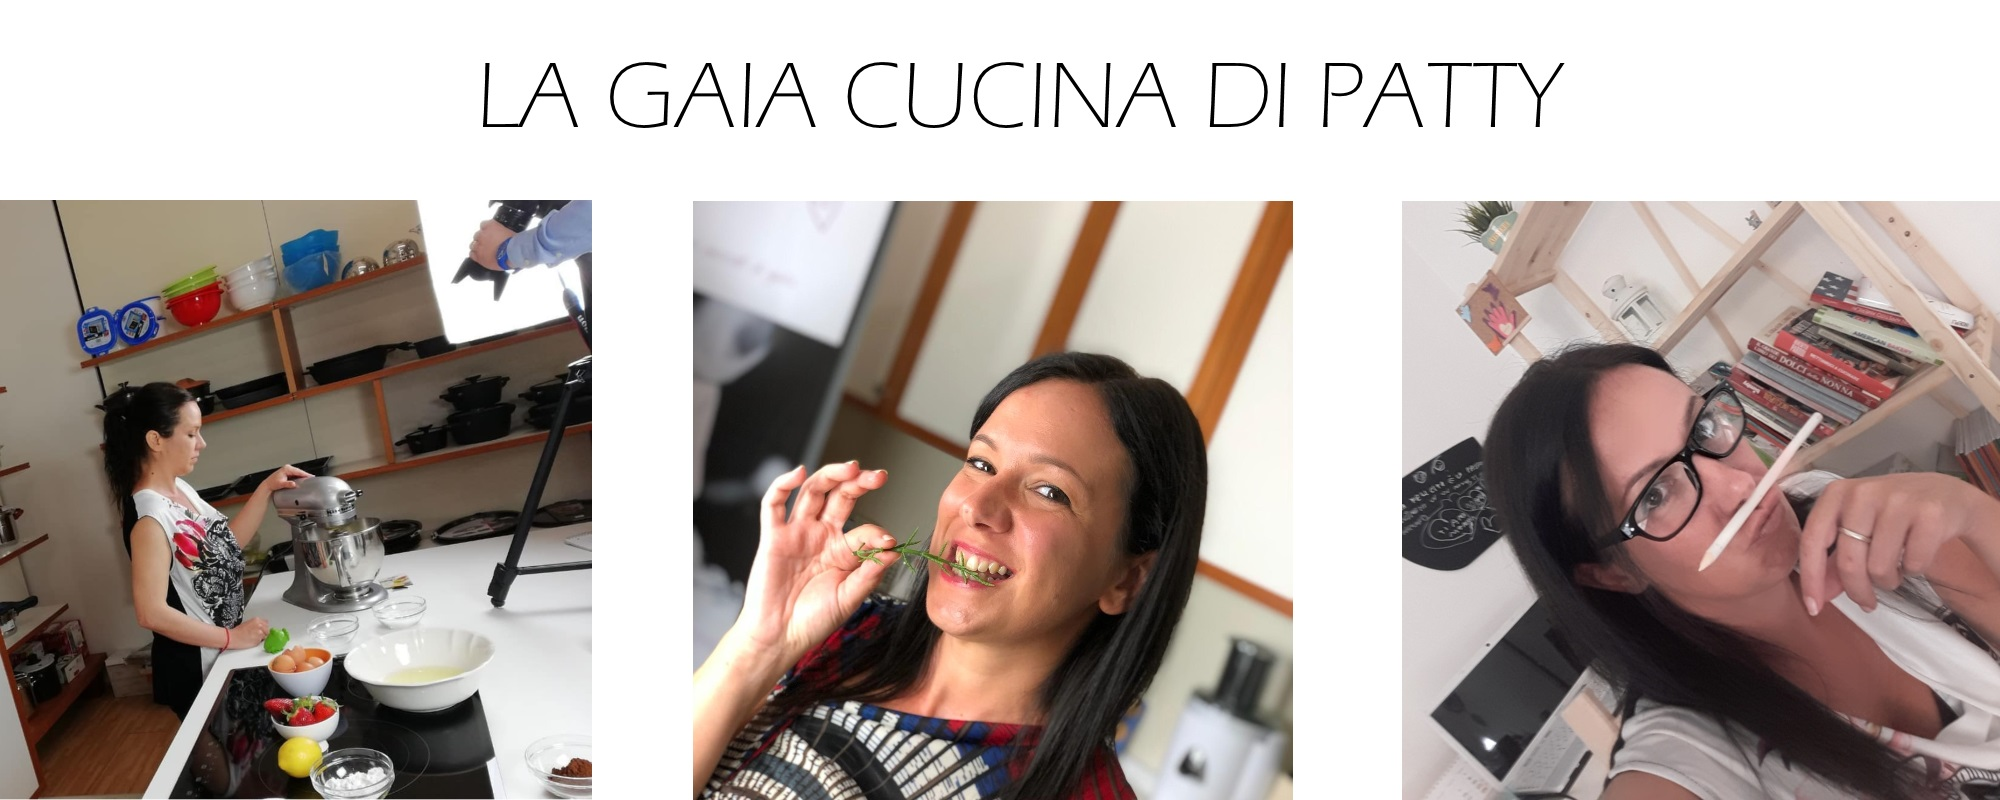 Member Directory - La gaia cucina di Patty